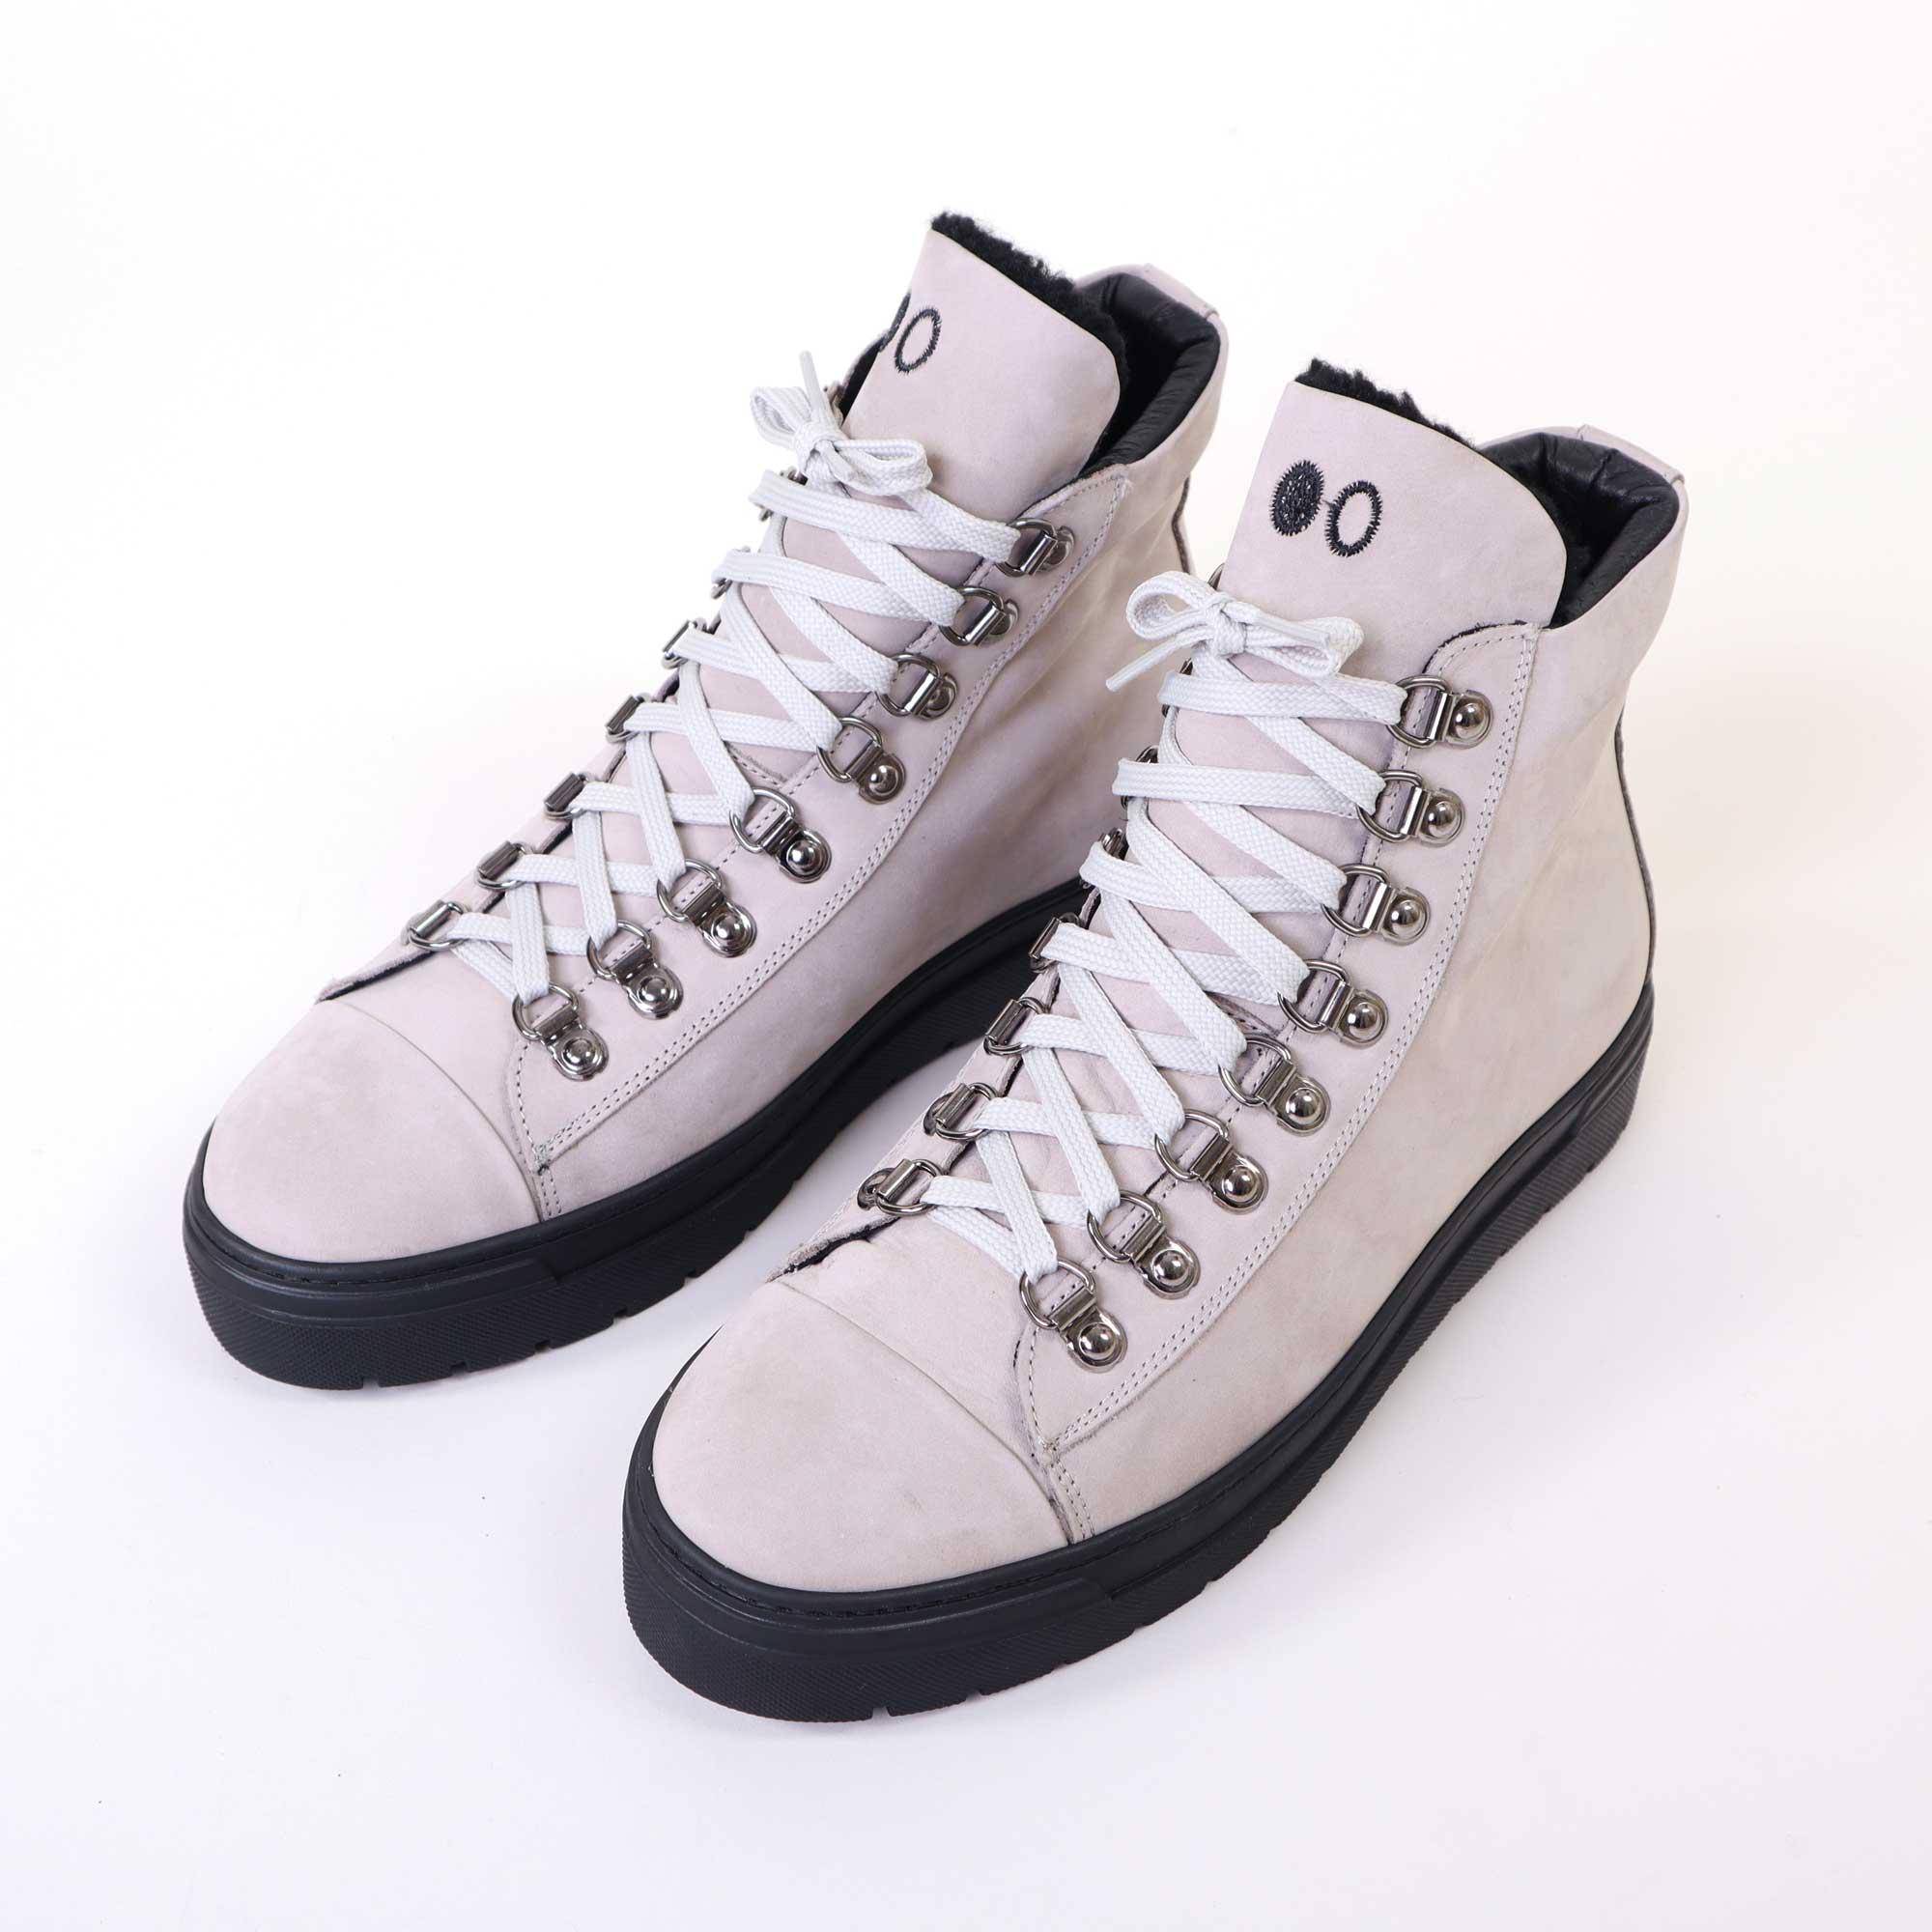 sneakers-h-grey-3